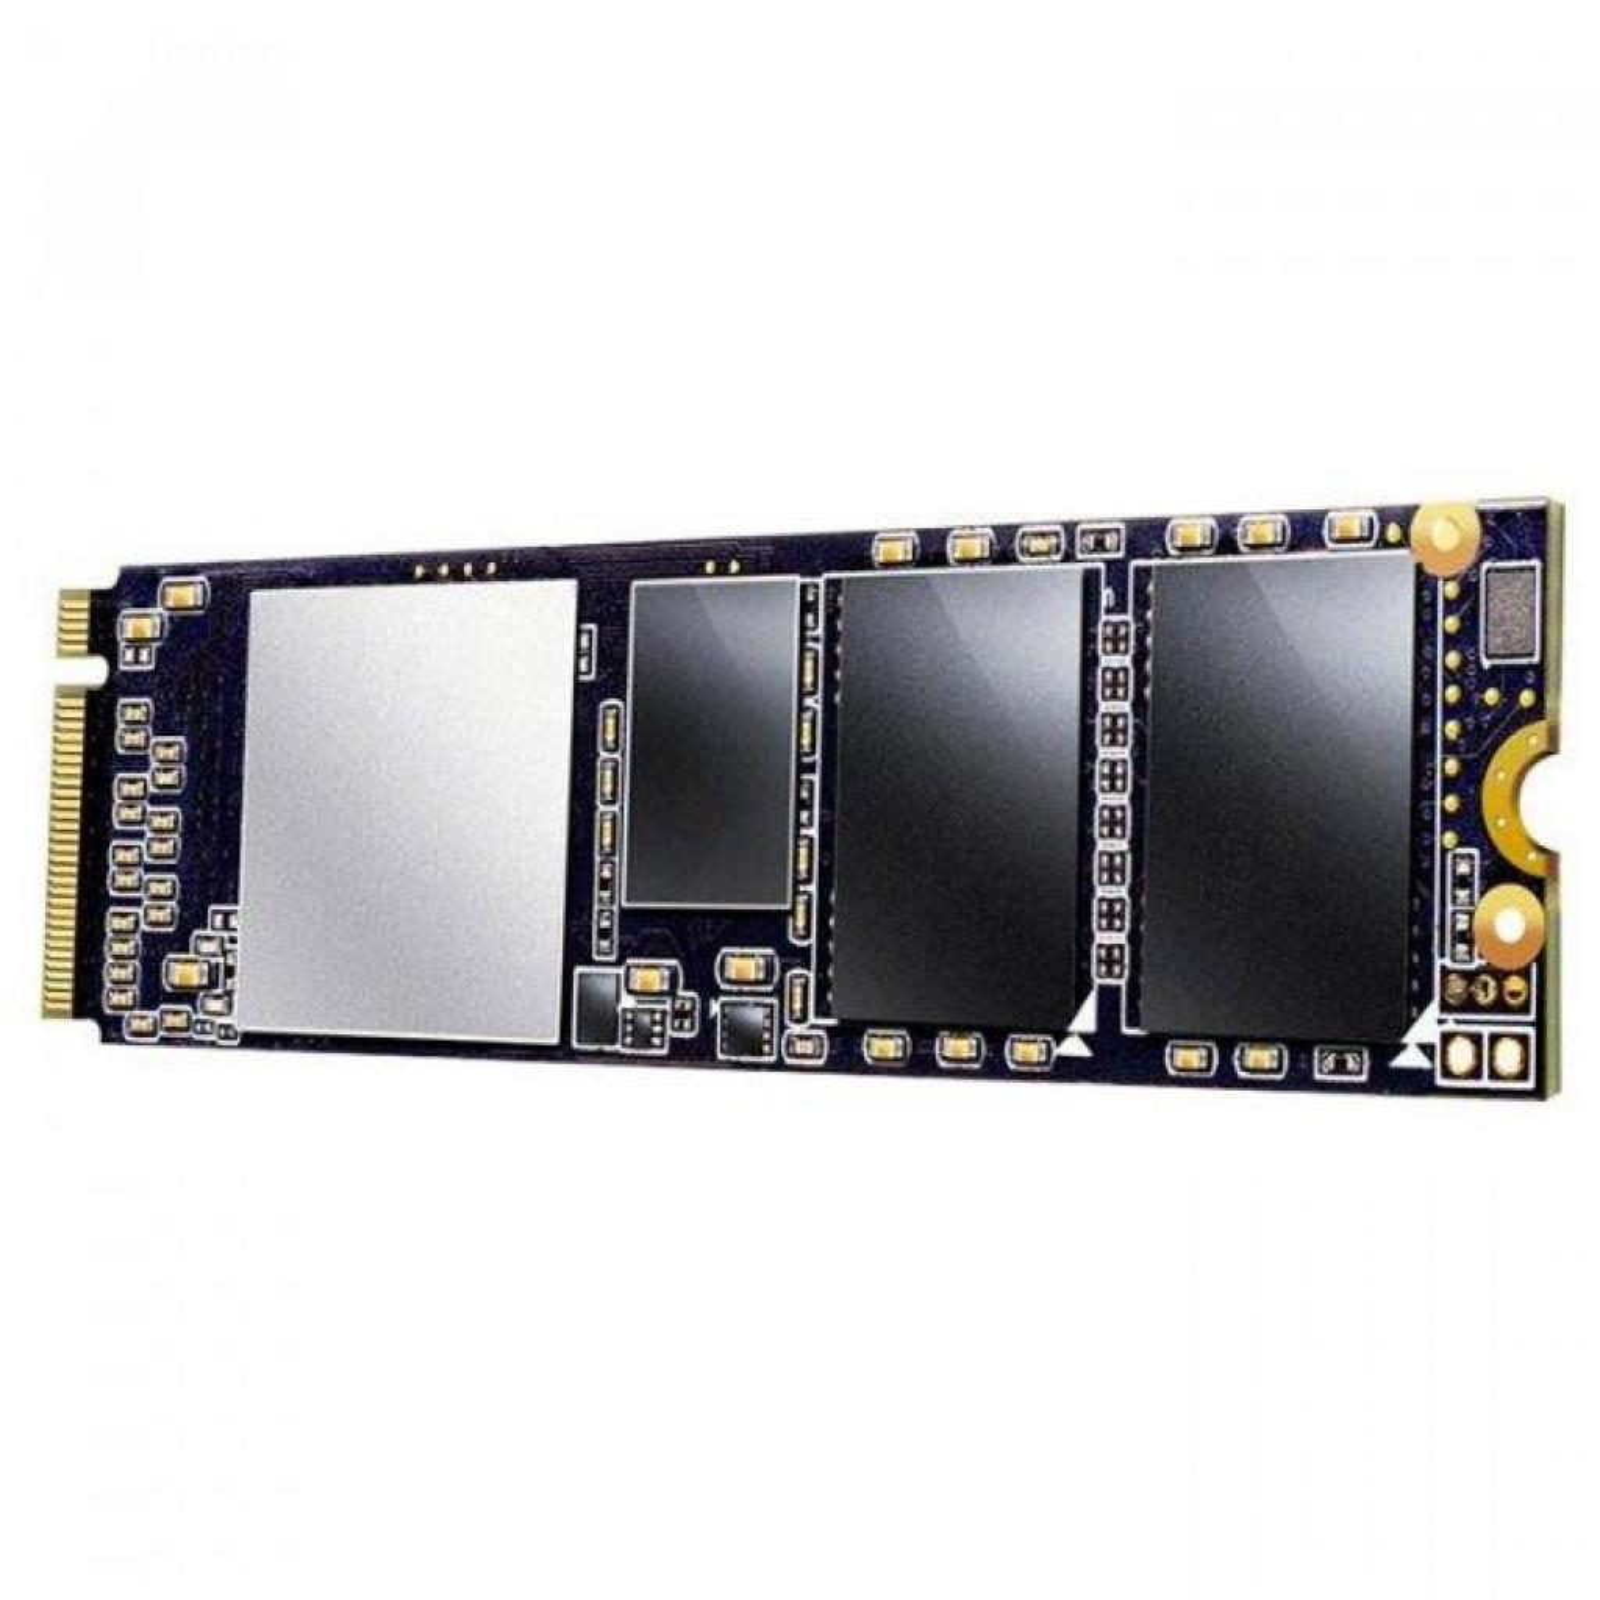 Накопитель SSD M.2 2280 1TB ADATA (ASX6000NP-1TT-C) изображение 3